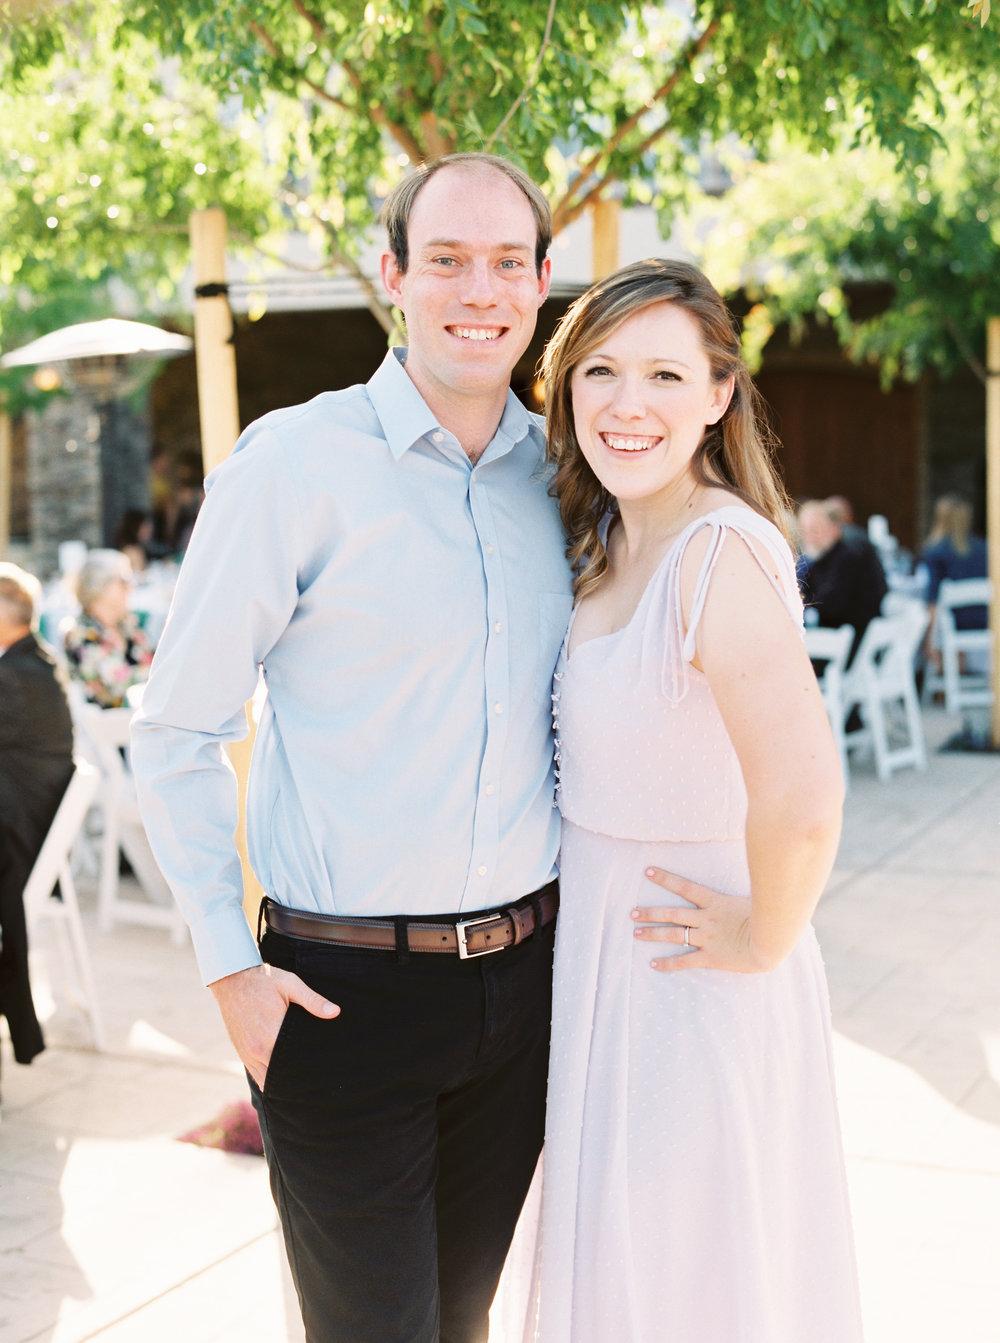 wolfe-heights-event-center-wedding-sacramento-california-wedding-71.jpg